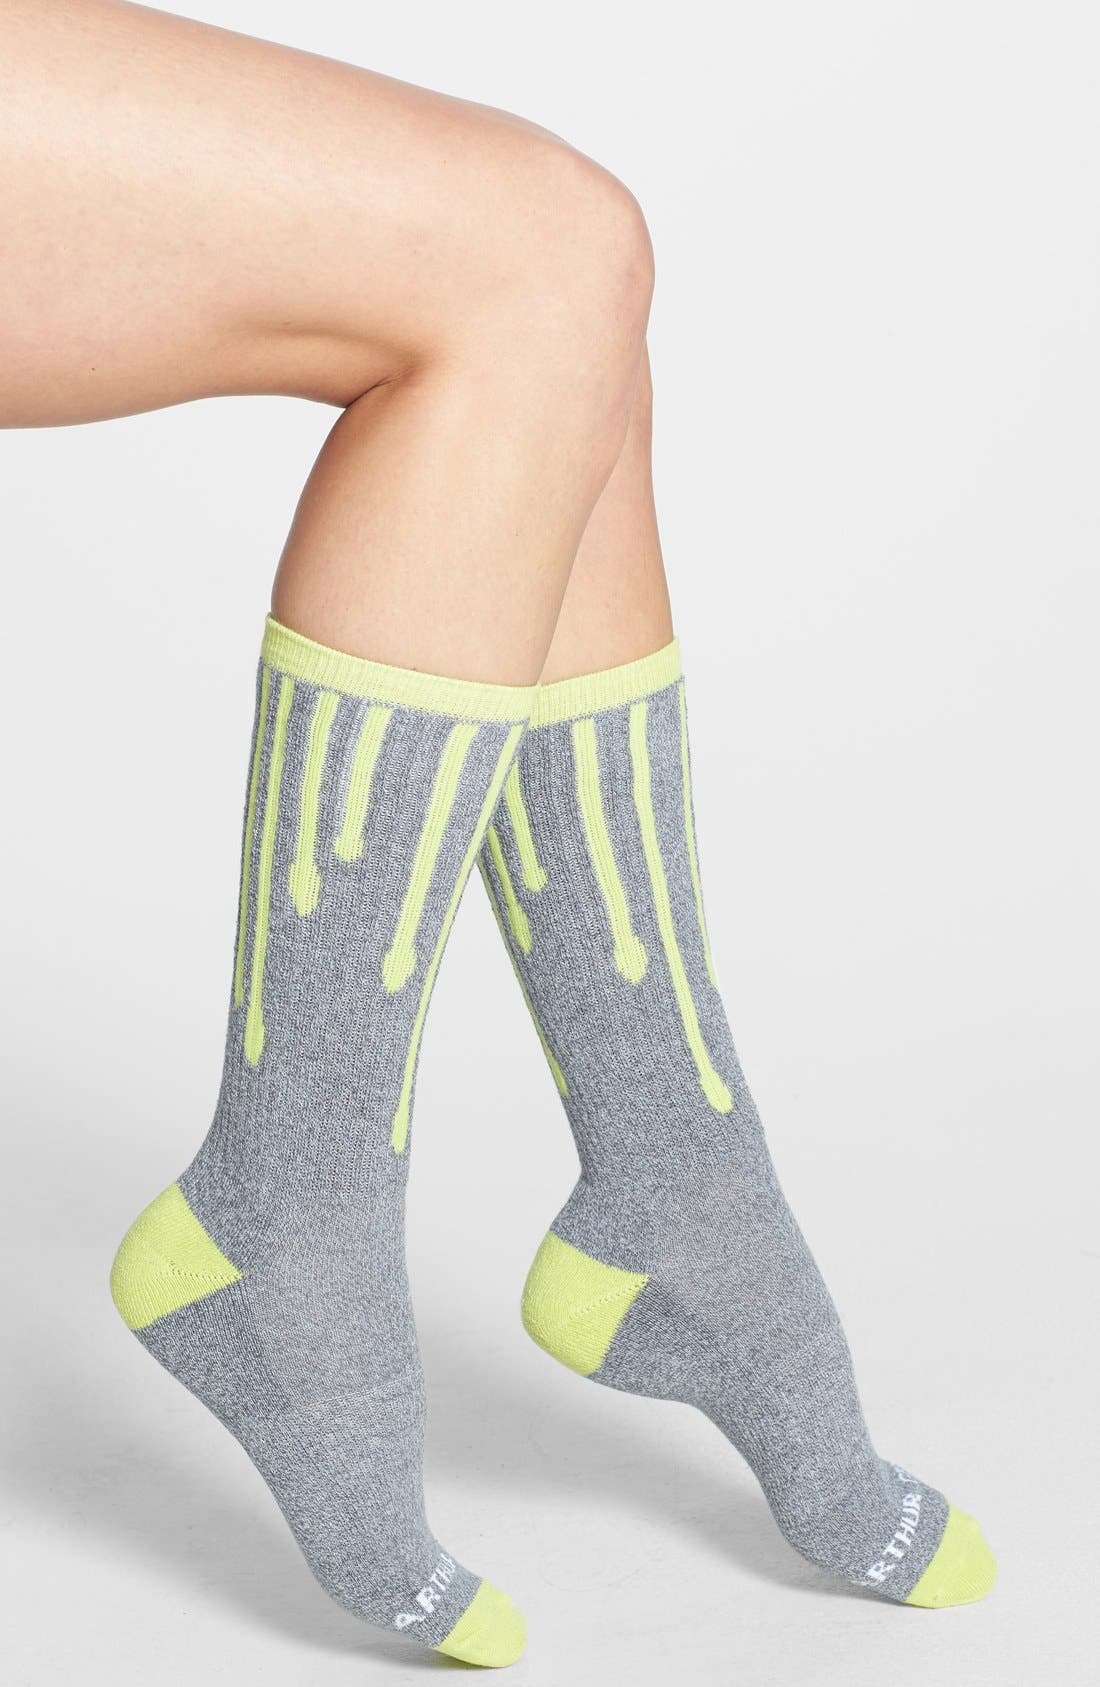 'Drips' Socks,                             Main thumbnail 1, color,                             020